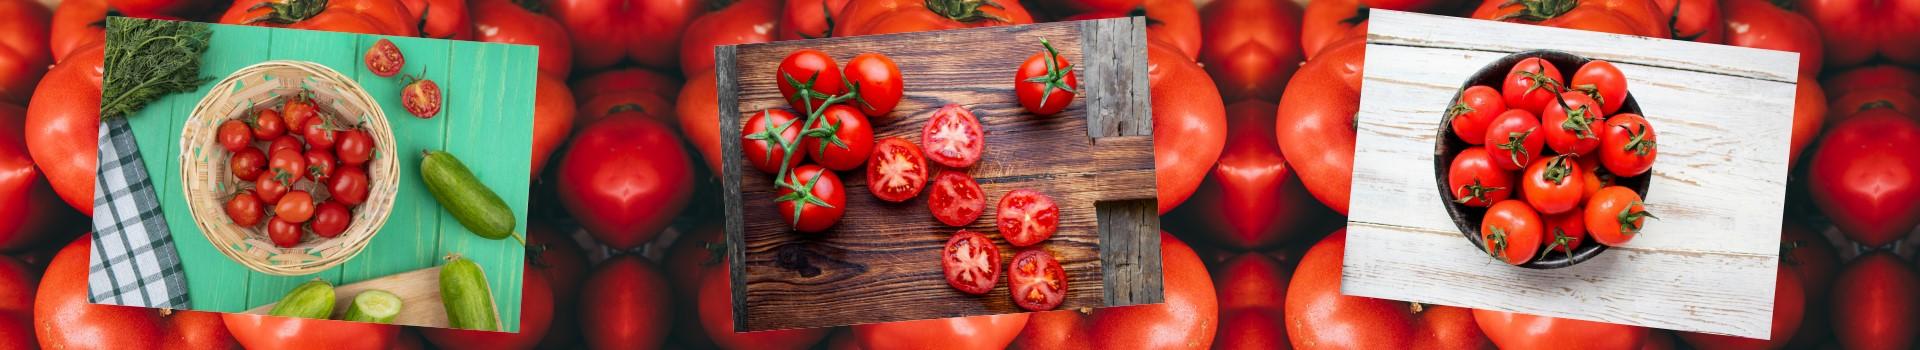 Tomate-Arten-WF